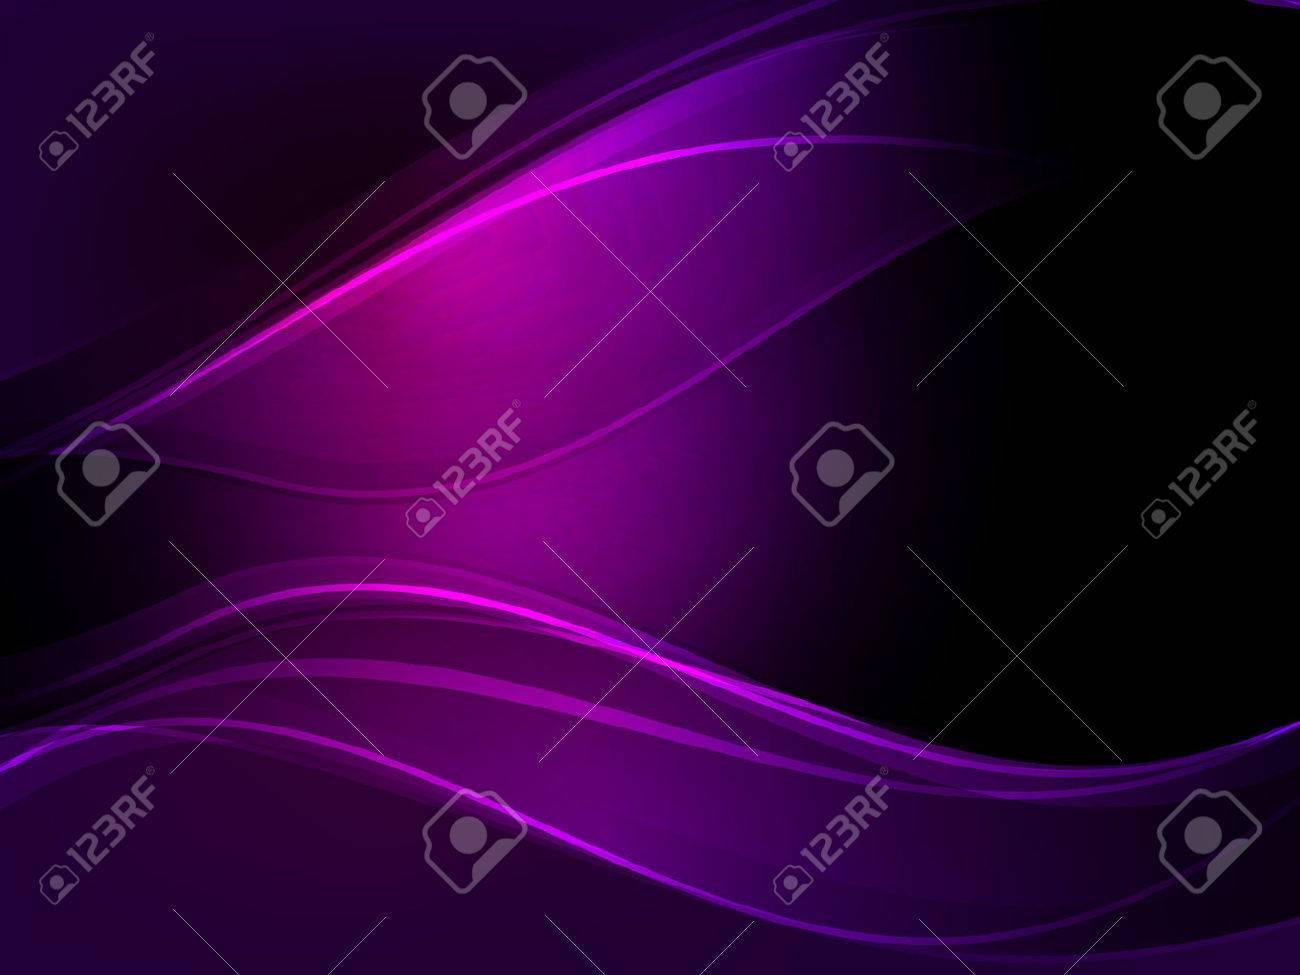 Abstract dark purple wave vector background. - 61846122